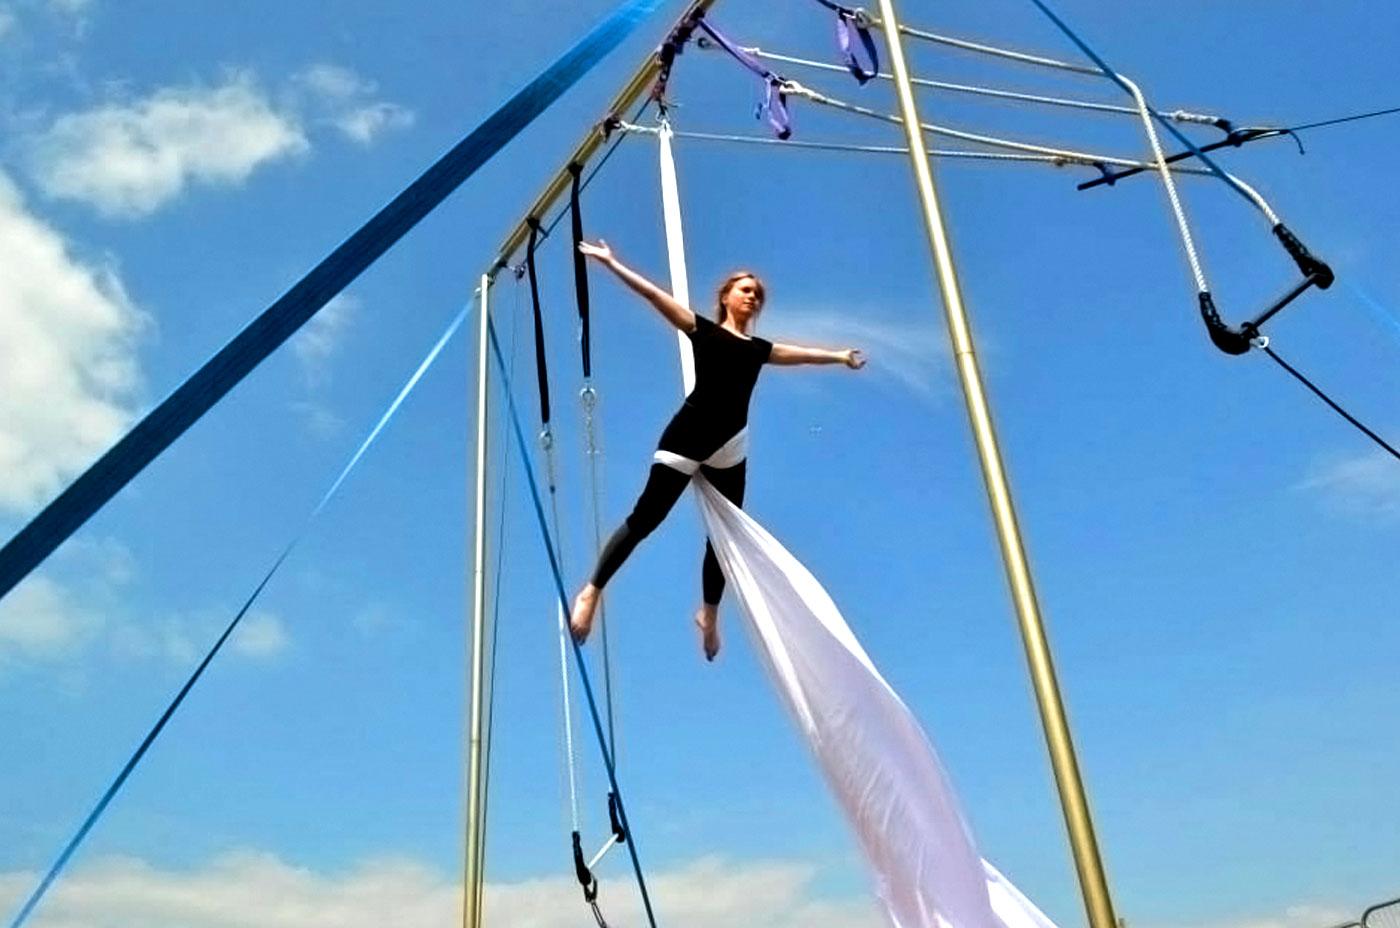 Circus Performance